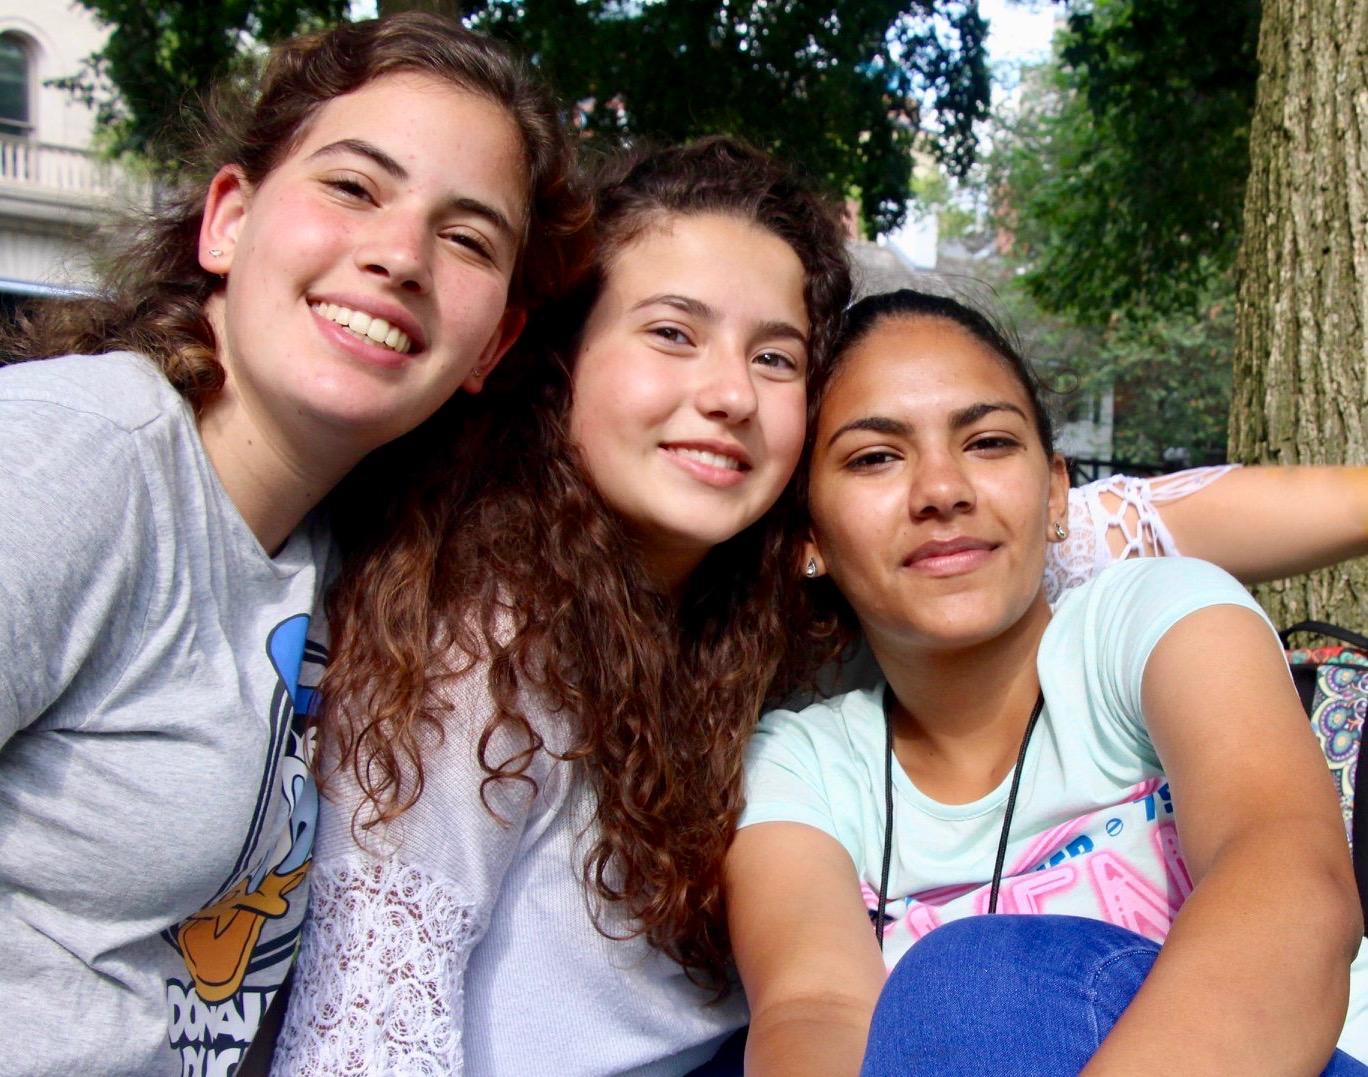 Jewish, Christian, and Muslim friendship